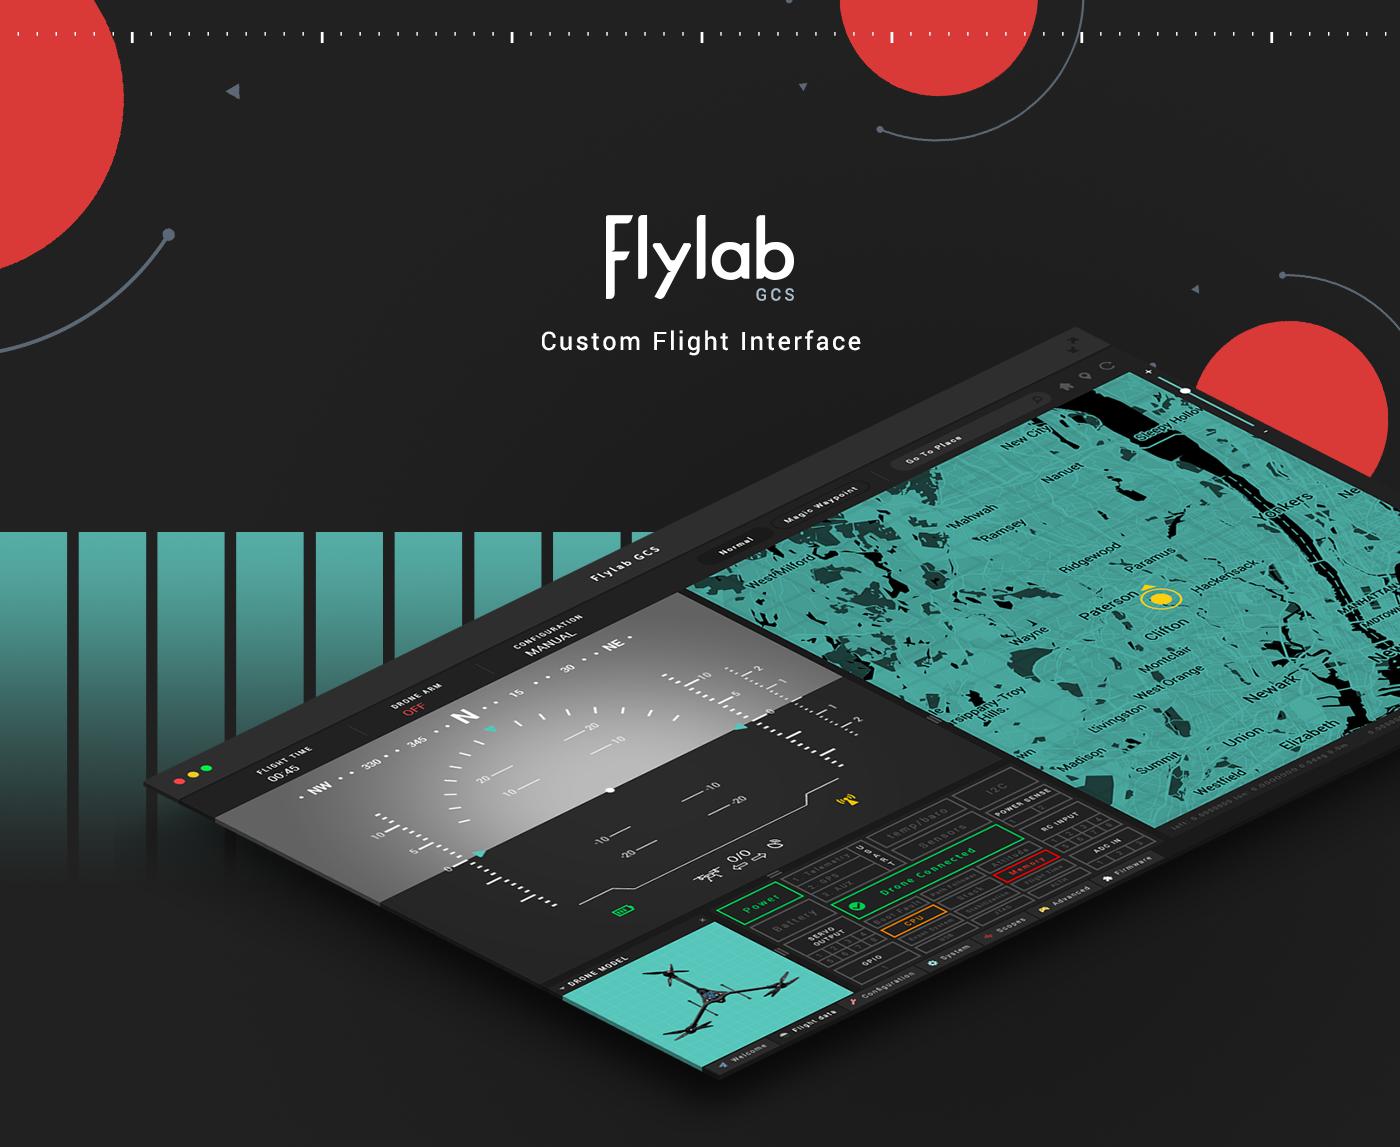 flylab gcs UI ux